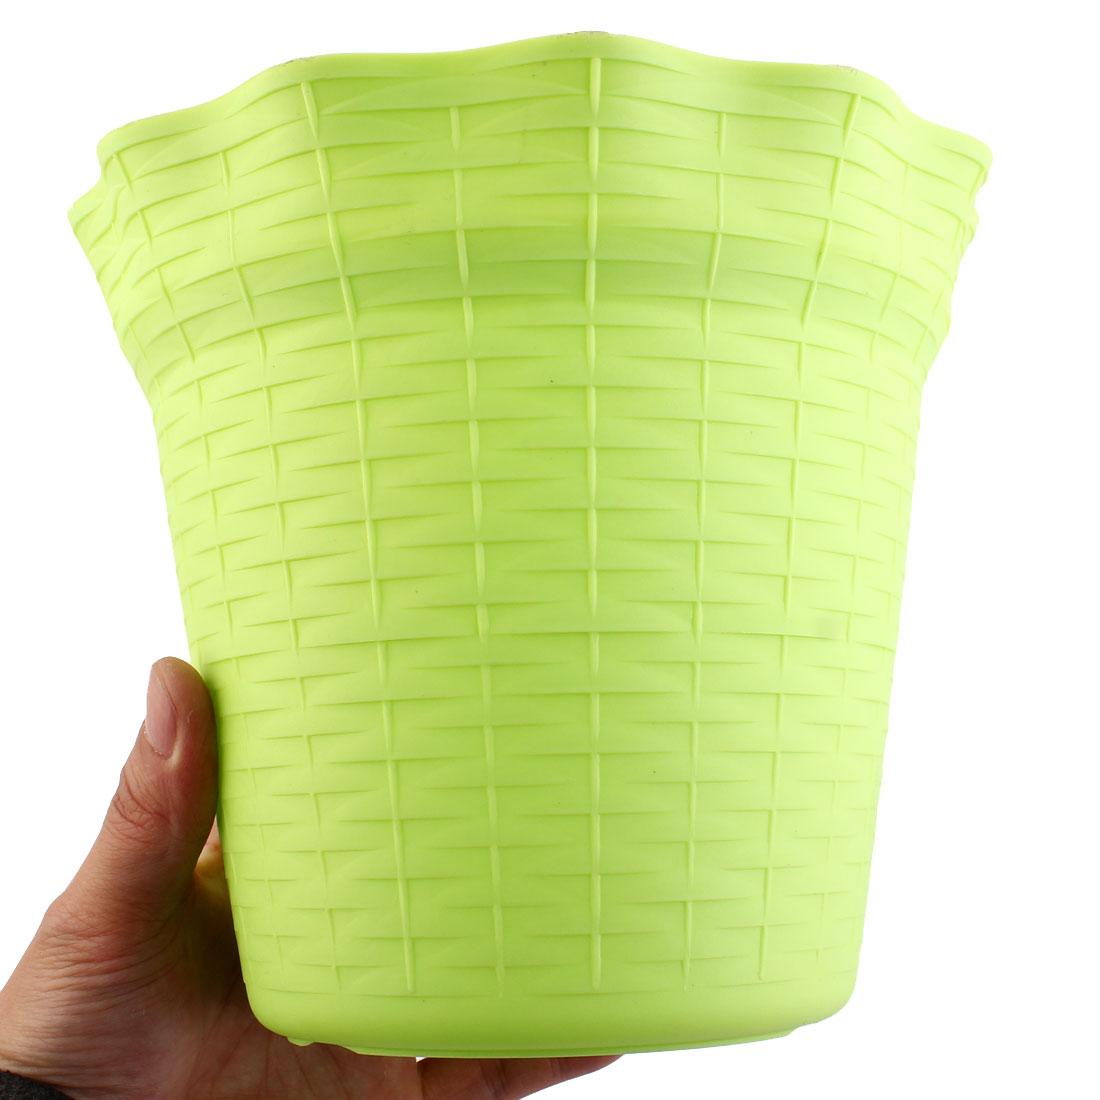 Green 18.7cm Diameter Plastic Flower Pot Plant Planter Home Garden Decor 5pcs - image 2 of 5